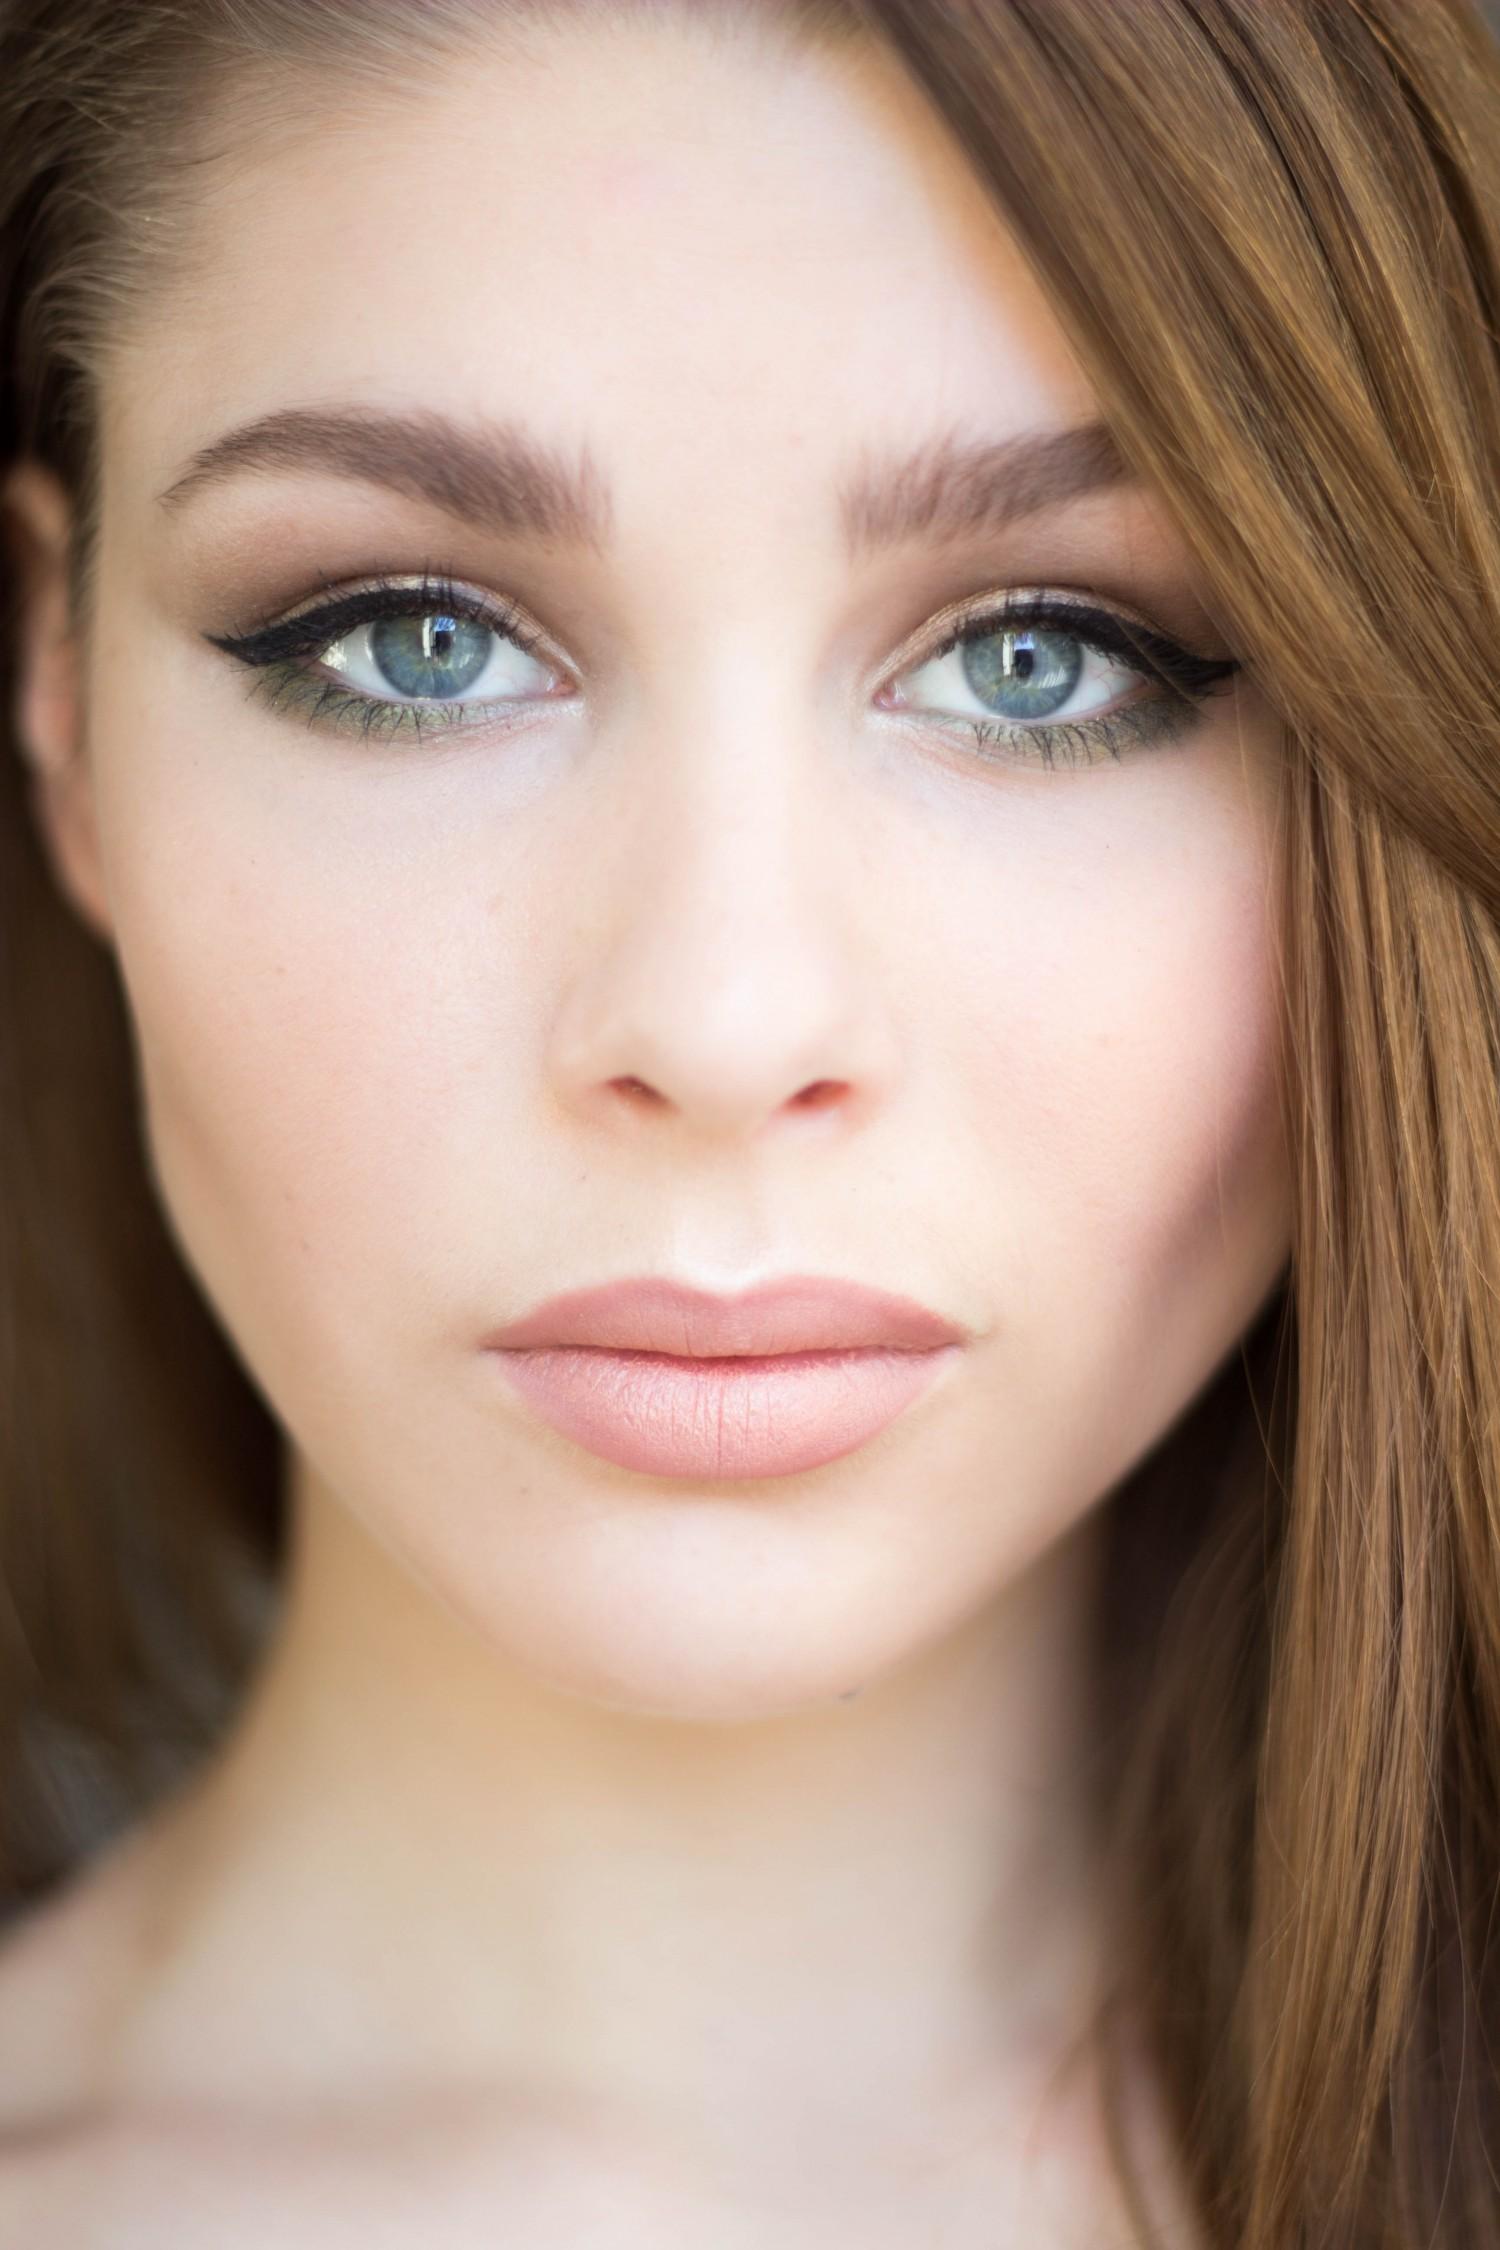 hint of green makeup, limegrøn makeup, nude læbestift, elf makeup, øjenskygge